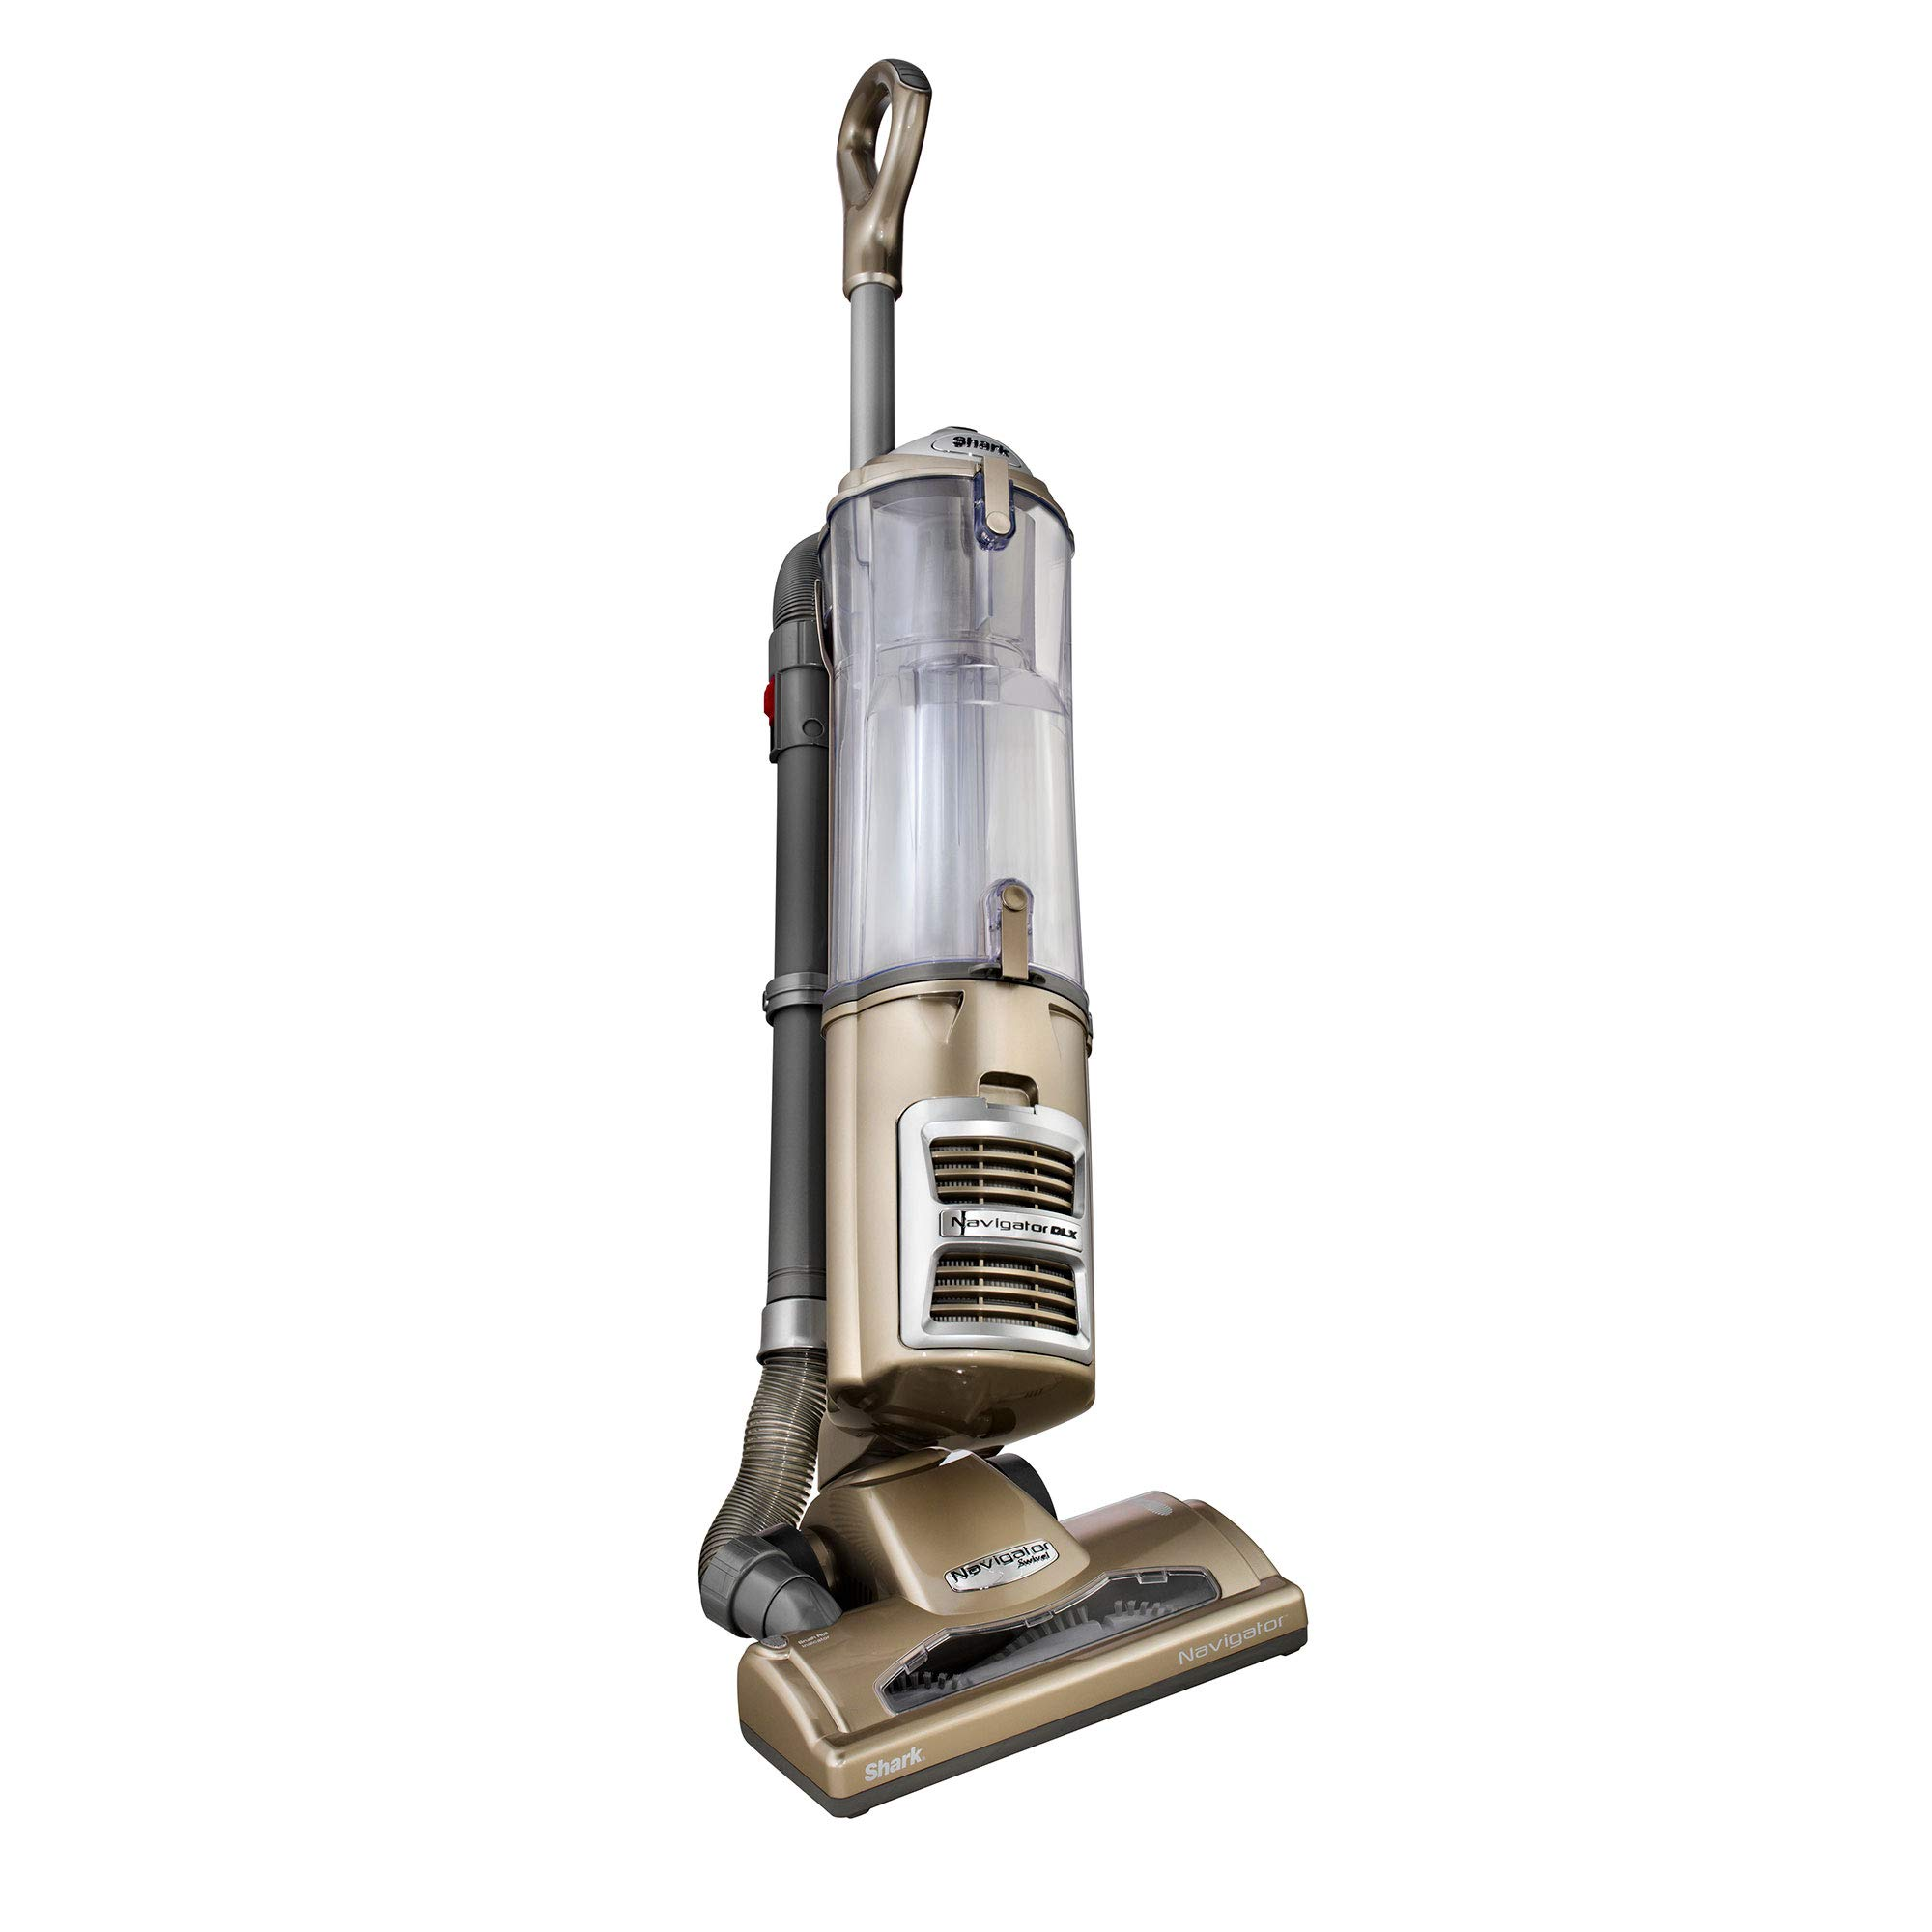 Shark NV70 Navigator Professional Upright Vacuum, Gold by Shark (Image #9)